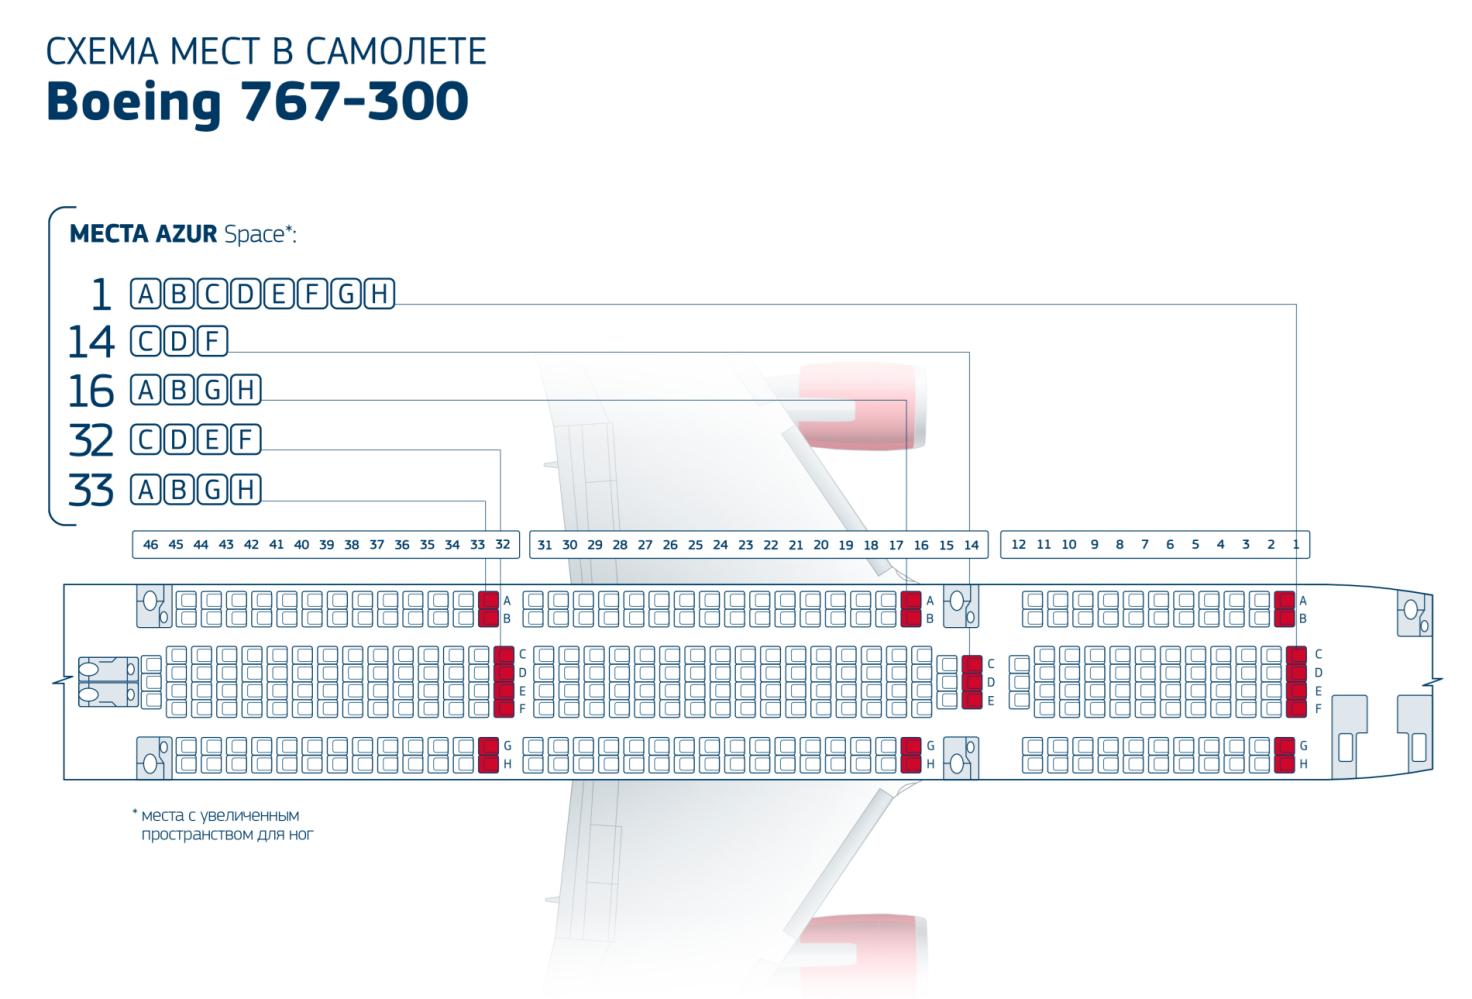 Боинг 737 схема салона лучшие места фото 23